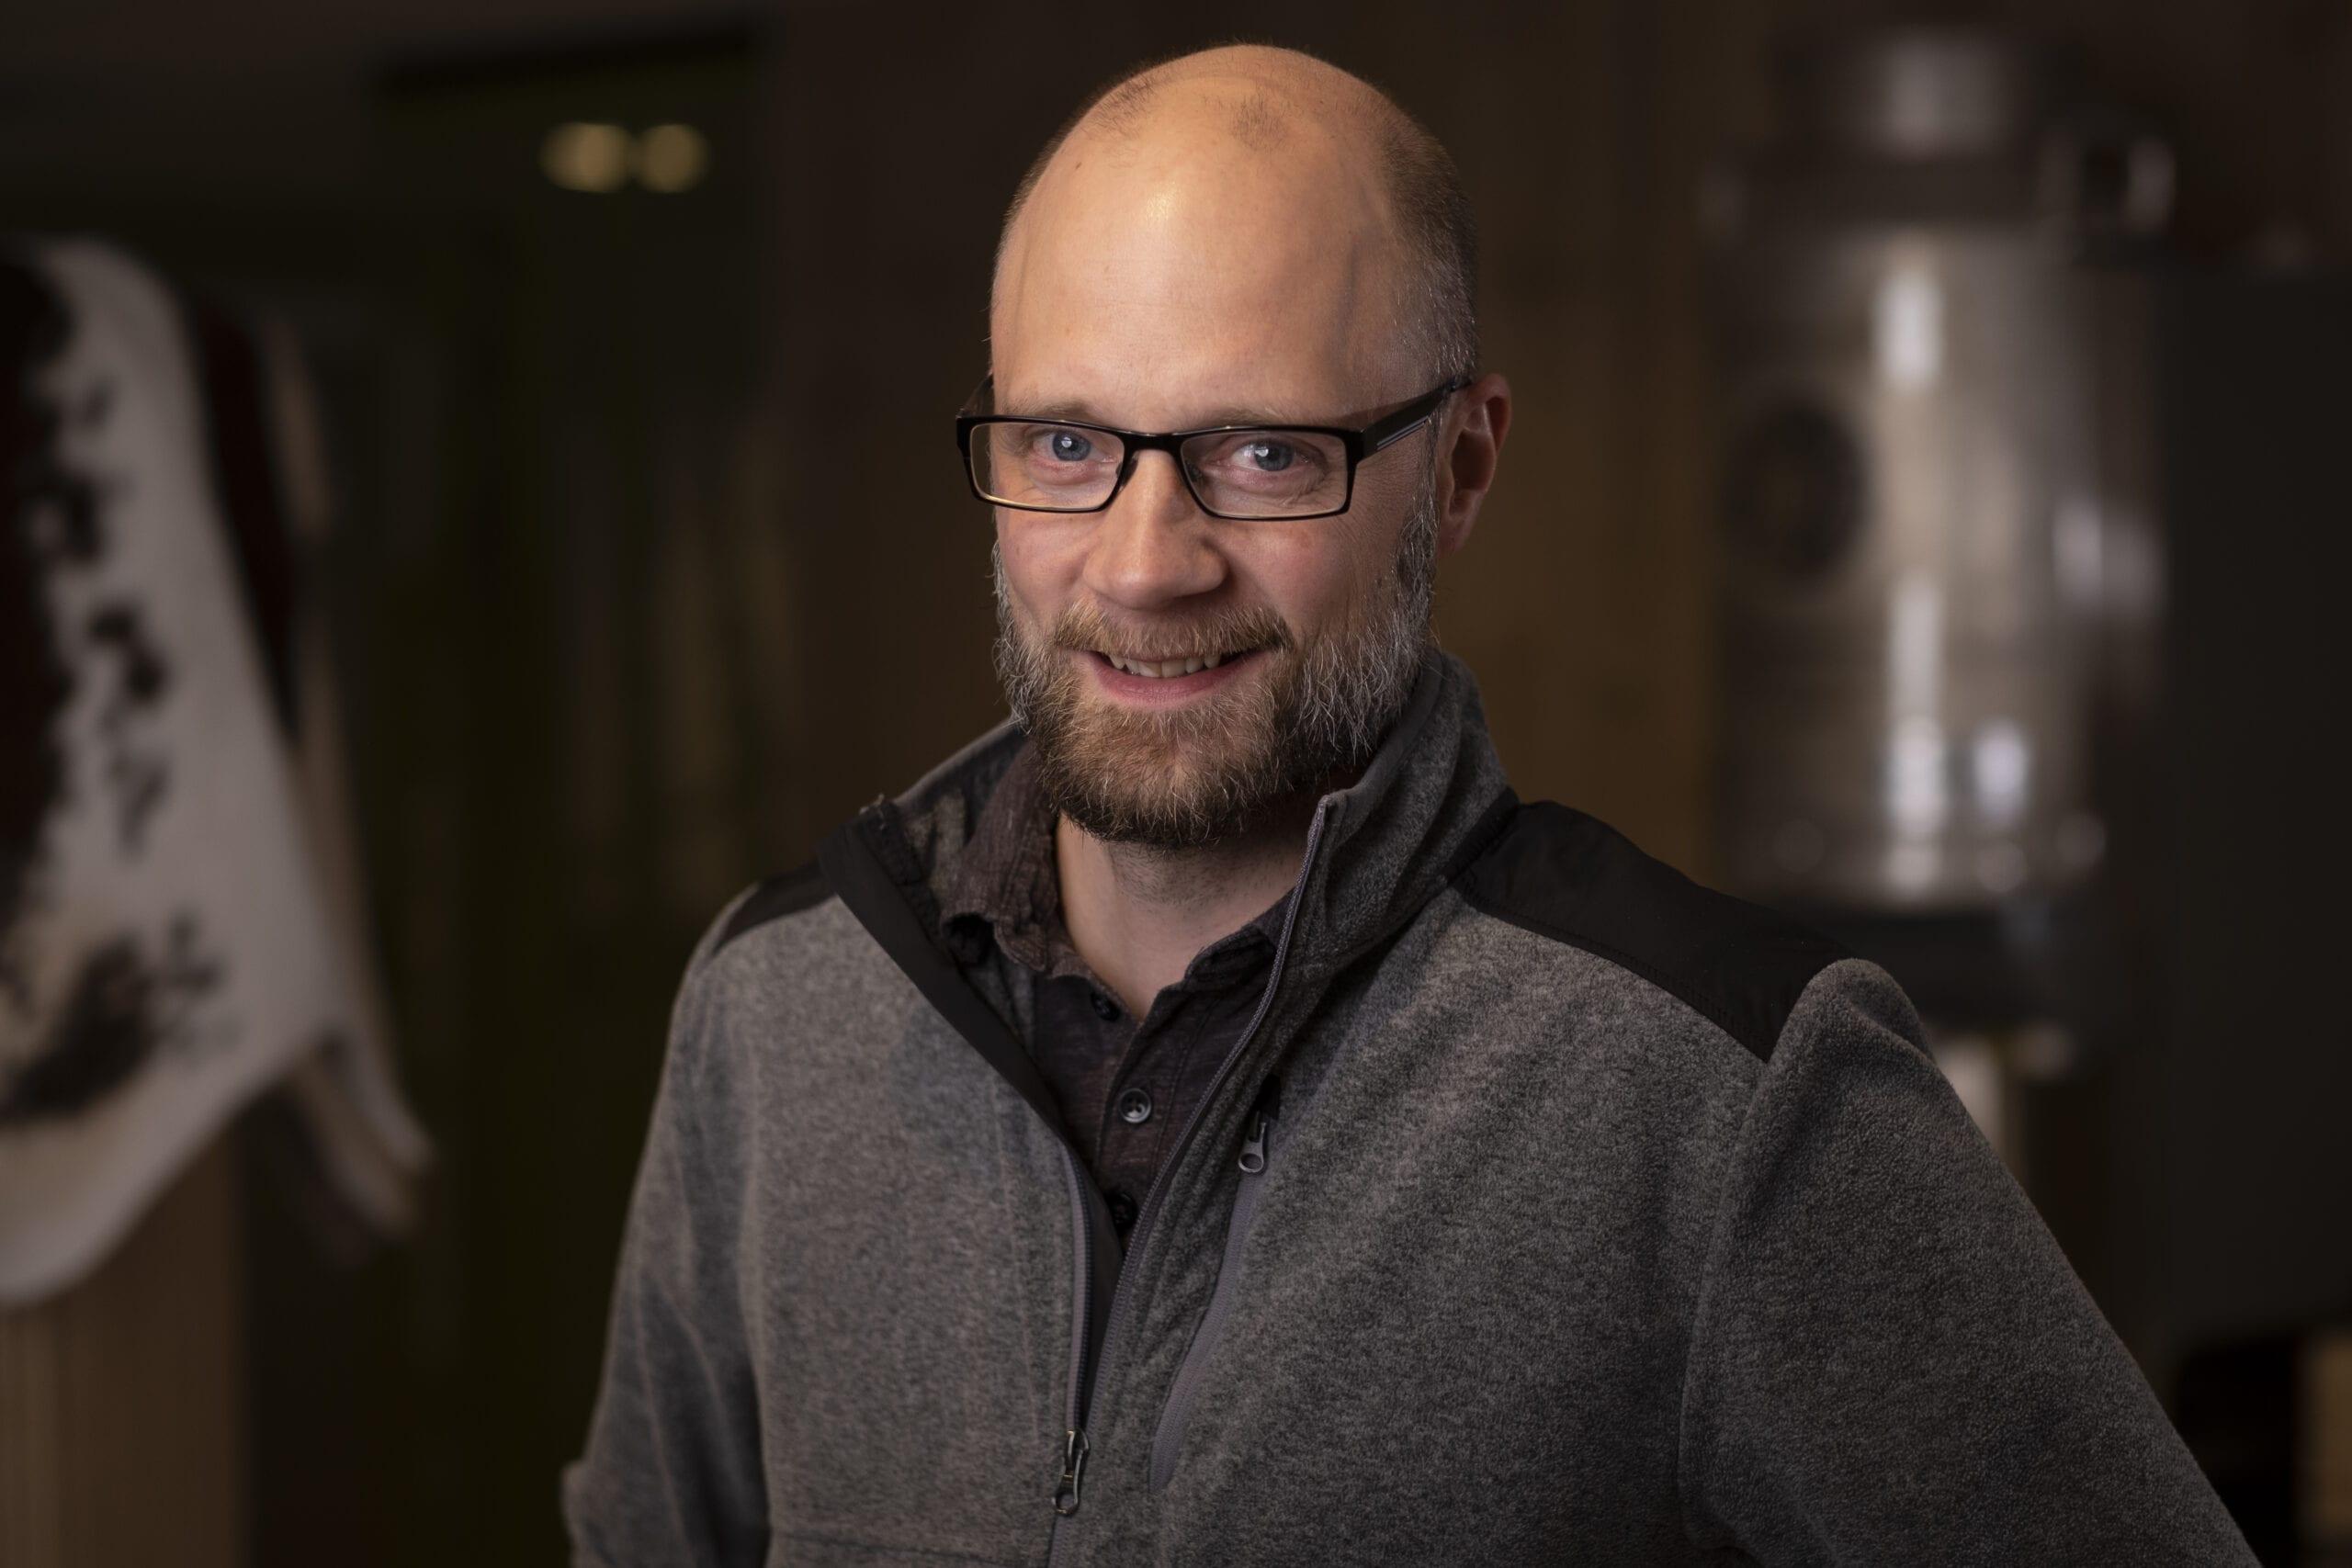 Jørgen Skancke Langen